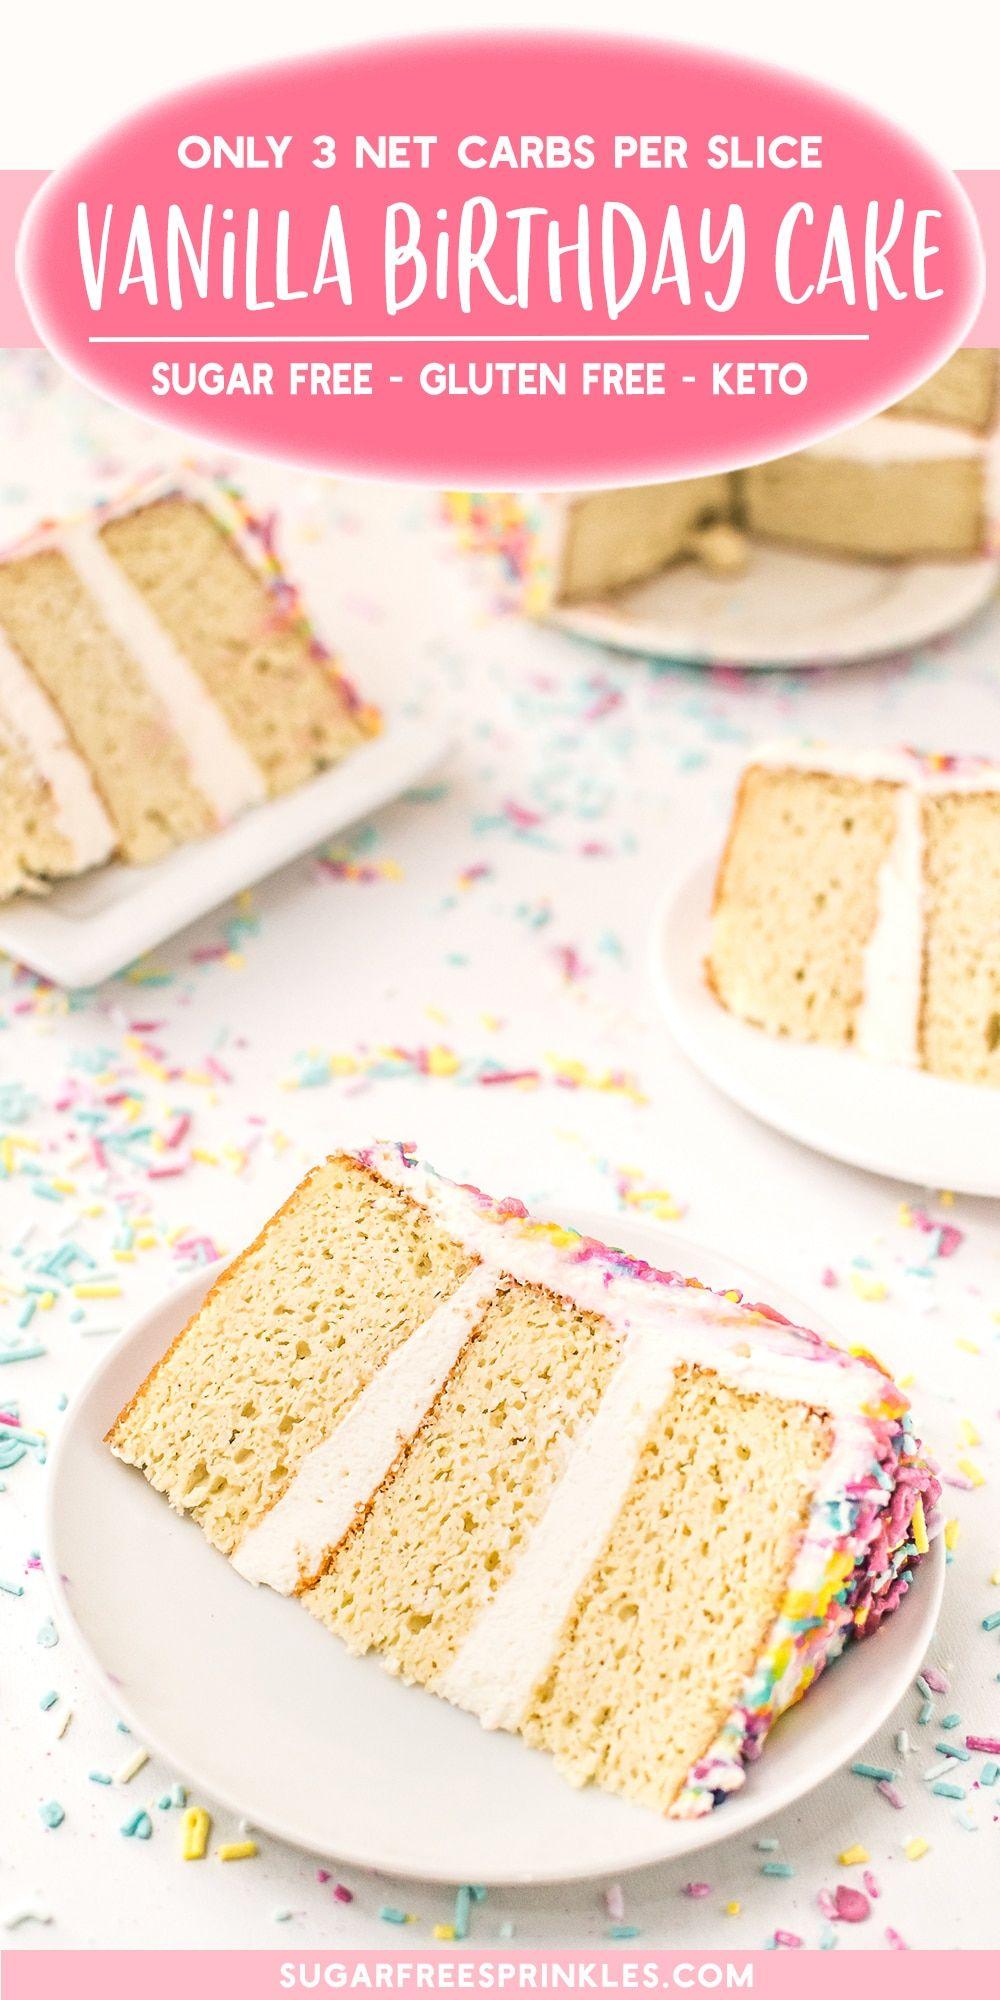 Make A Sugar-Free Birthday Cake Everyone Will Love